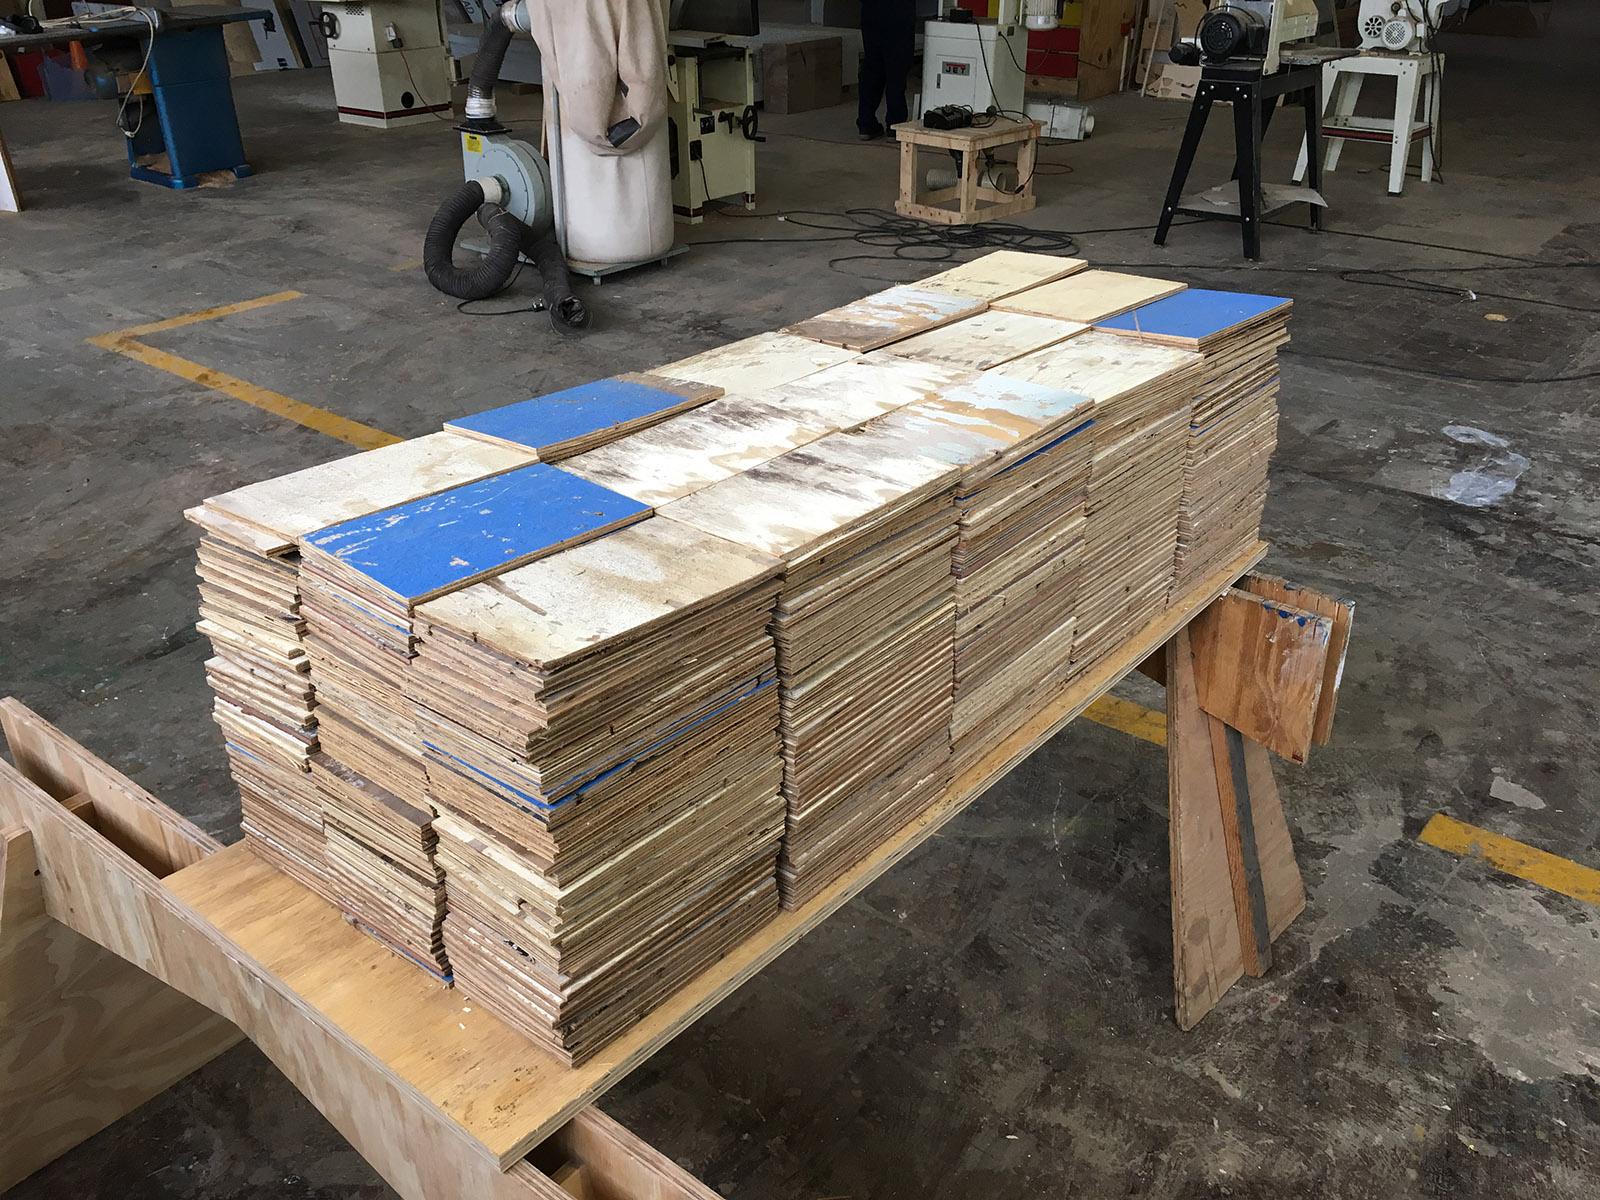 Stacks of shingles made of reused floorboards